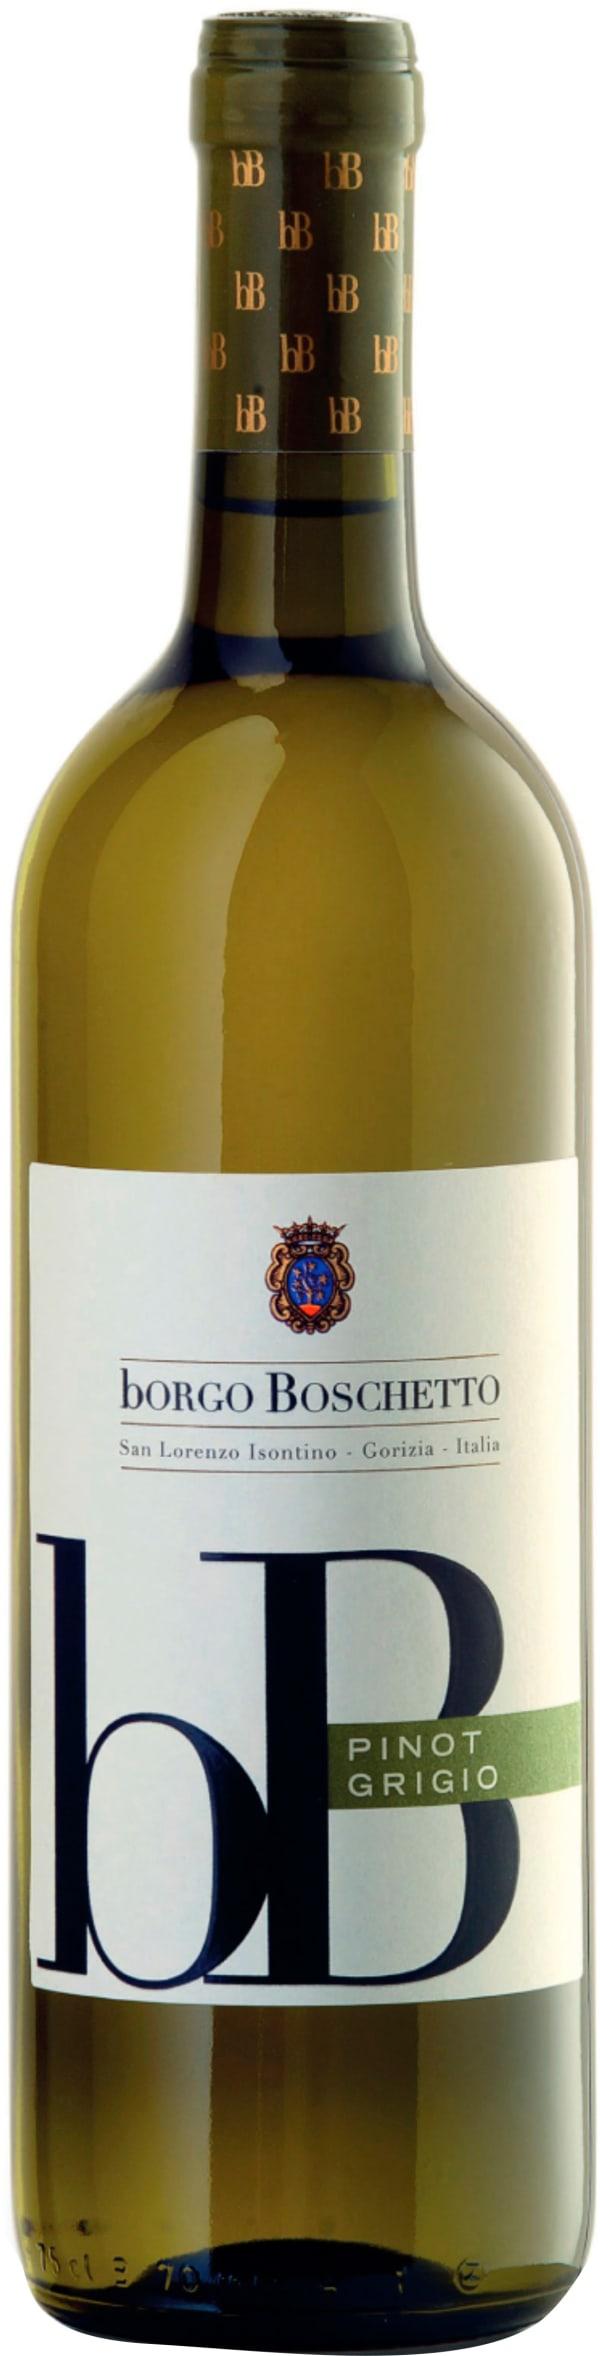 Scolaris Borgo Boschetto Pinot Grigio 2018